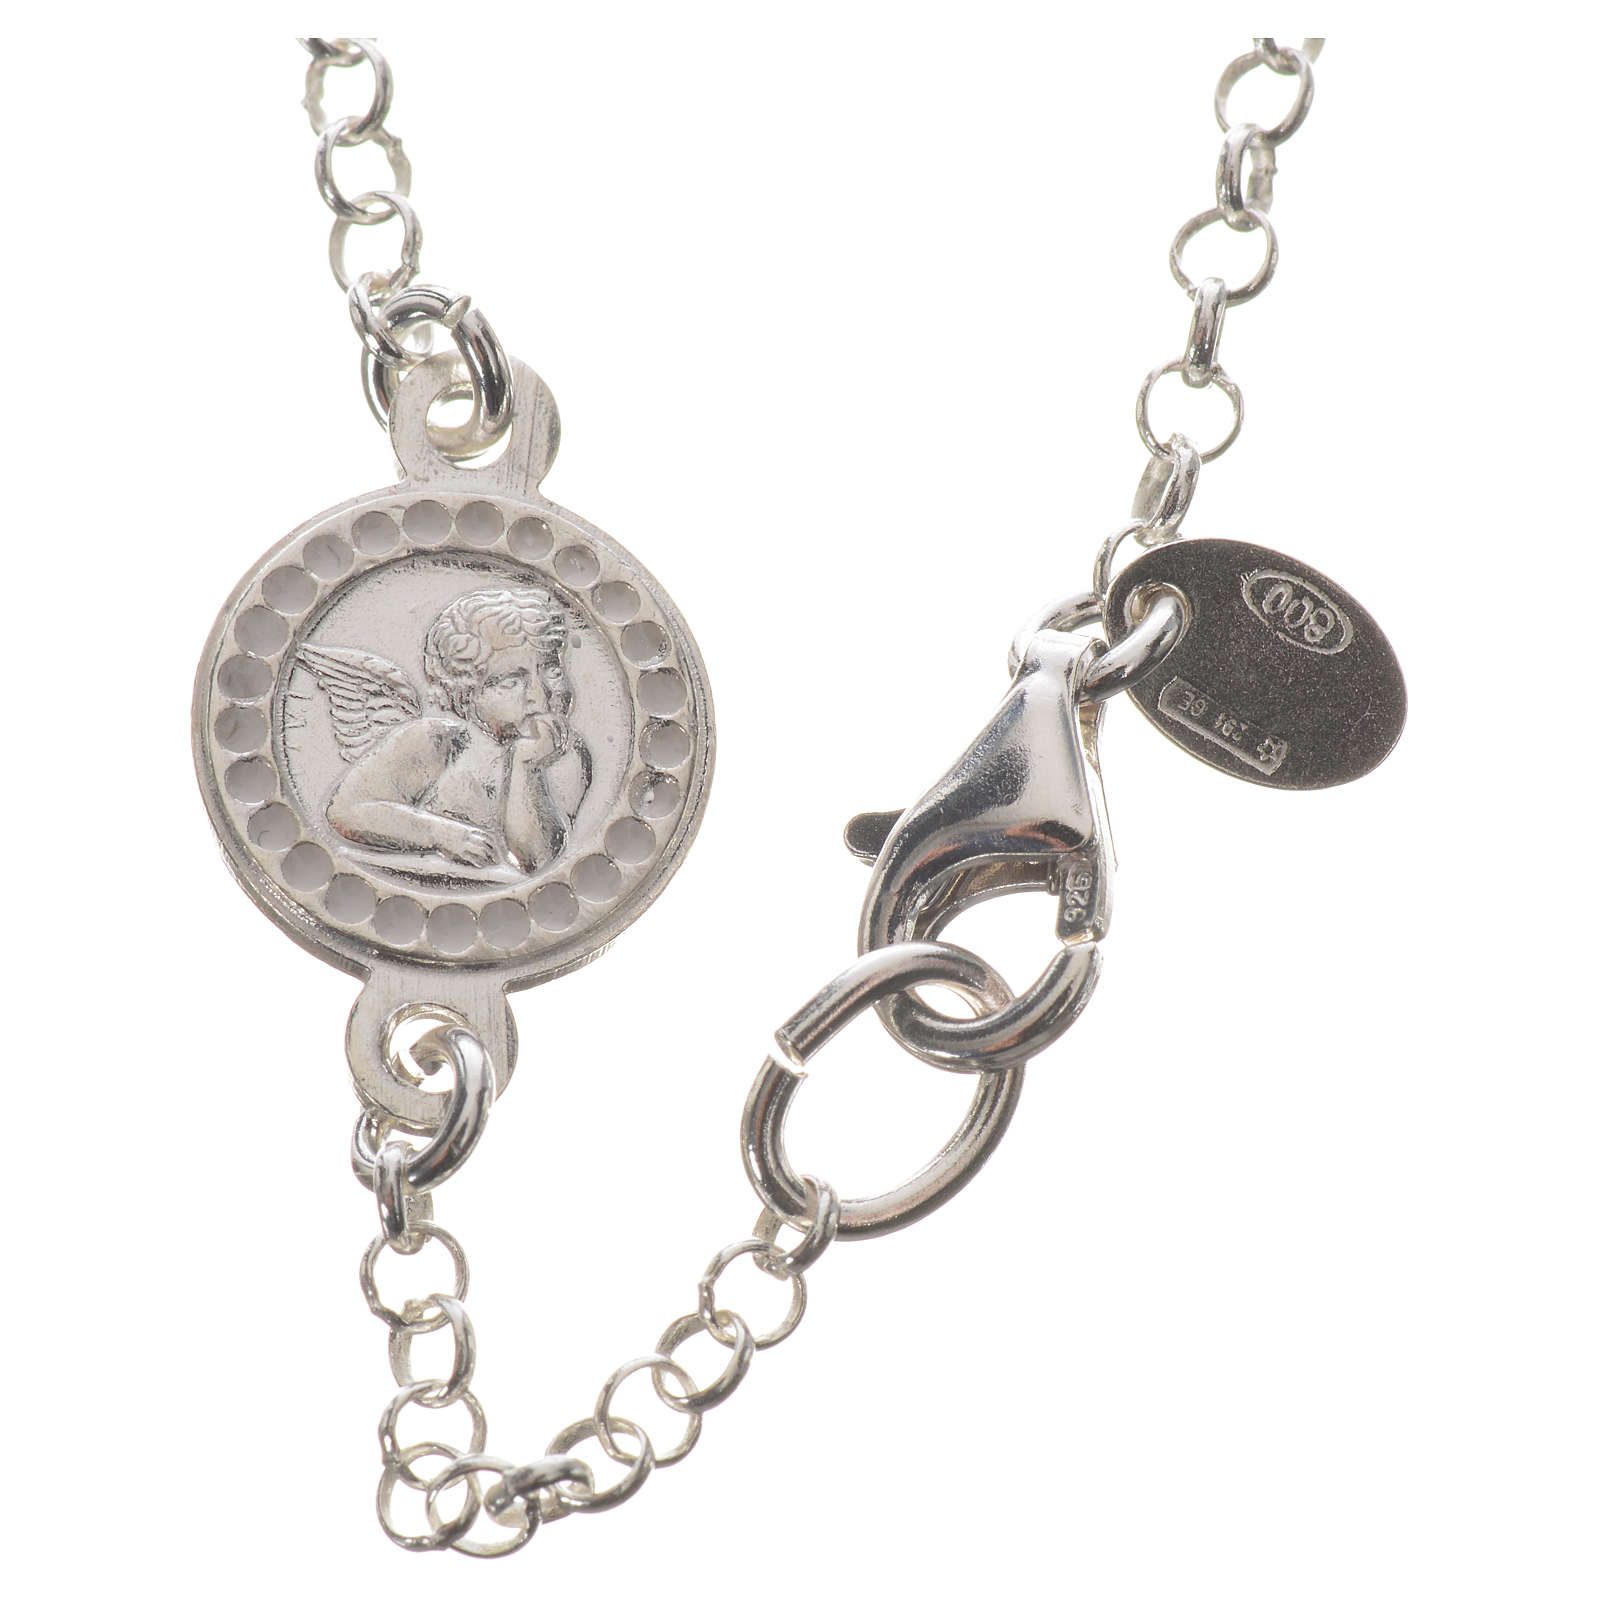 Bracciale in argento 800 e Swarovski 4